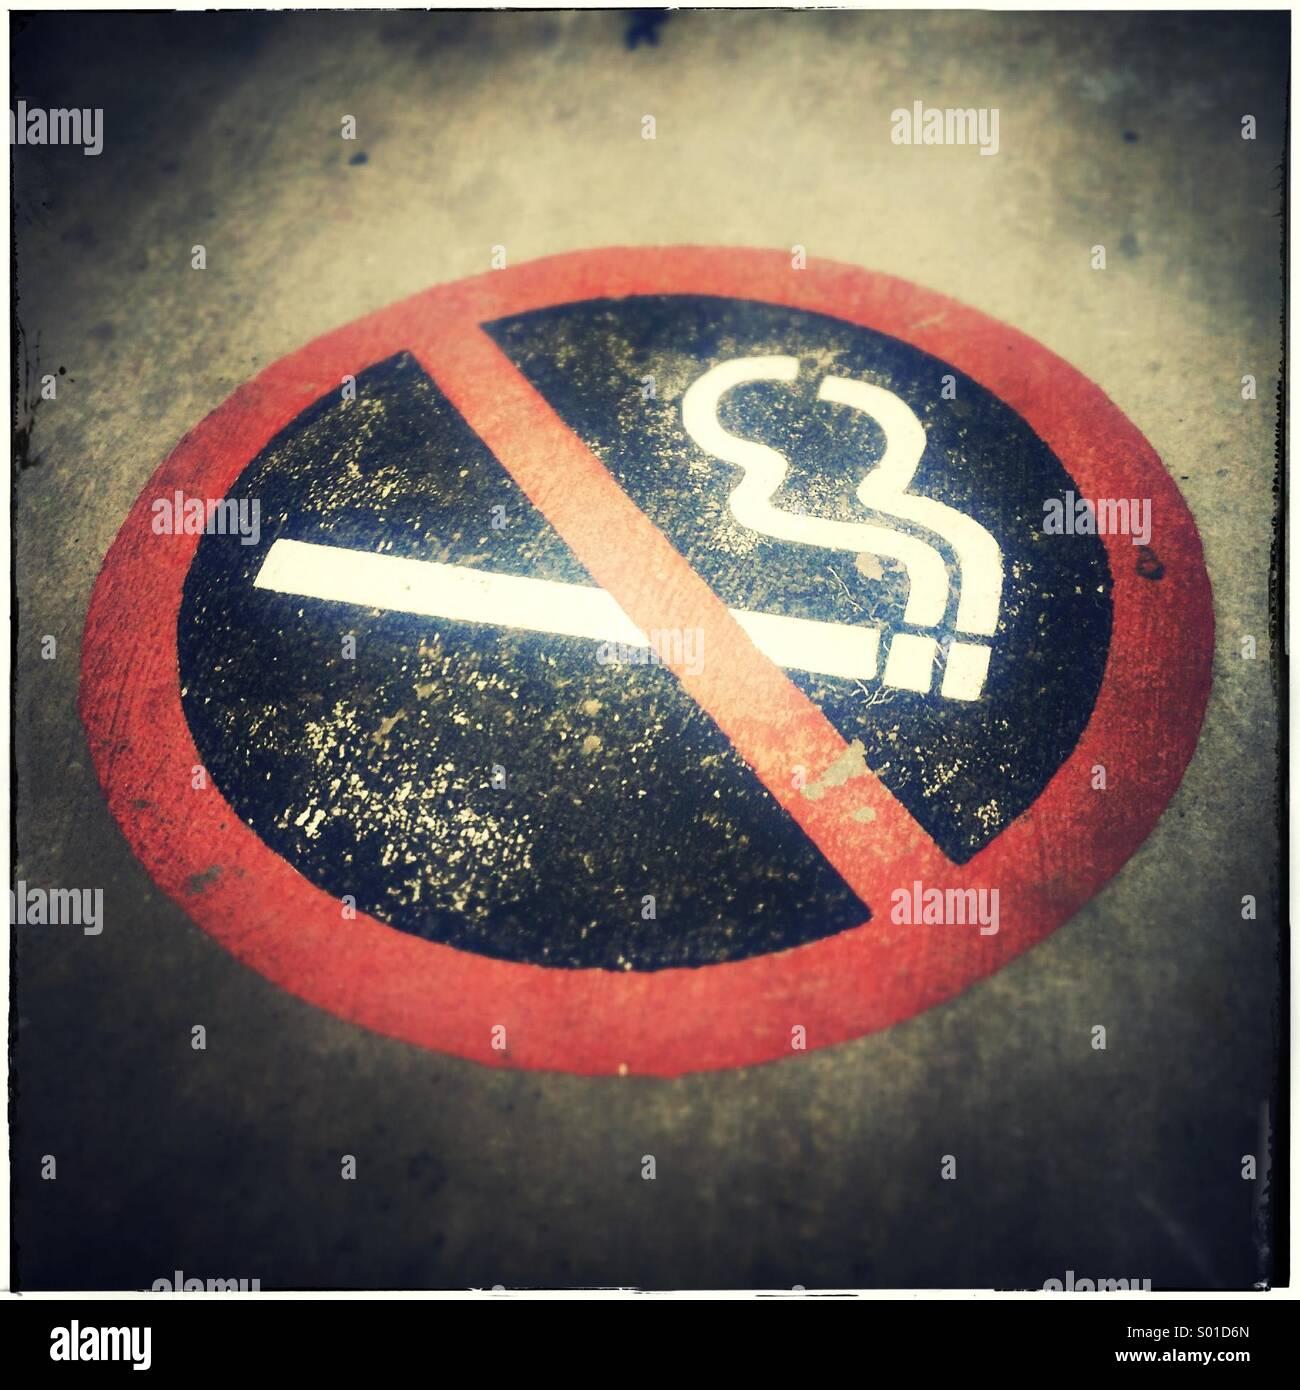 No smoking sign on pavement - Stock Image